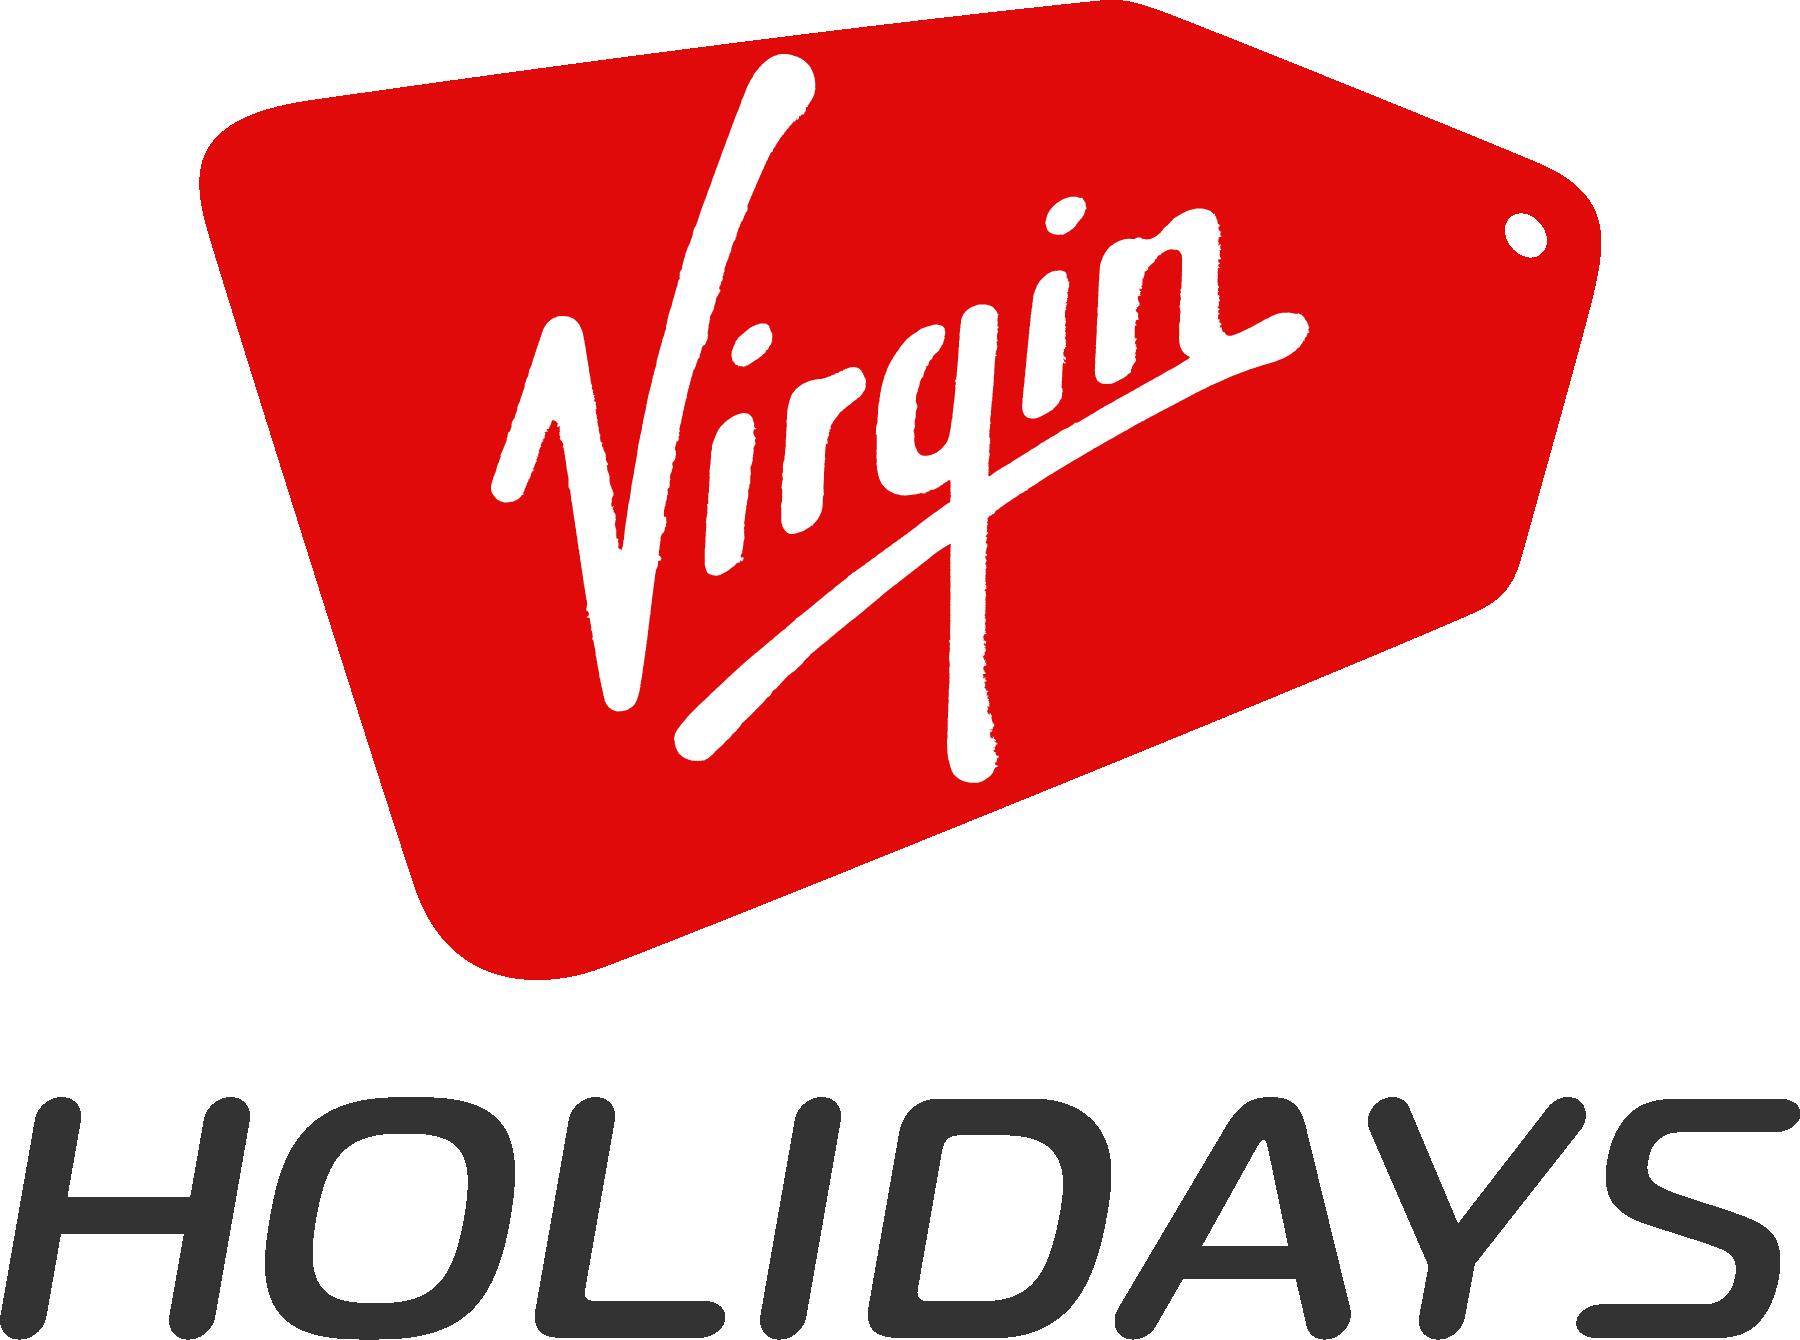 Virgin Holidays at Debenhams, Liverpool